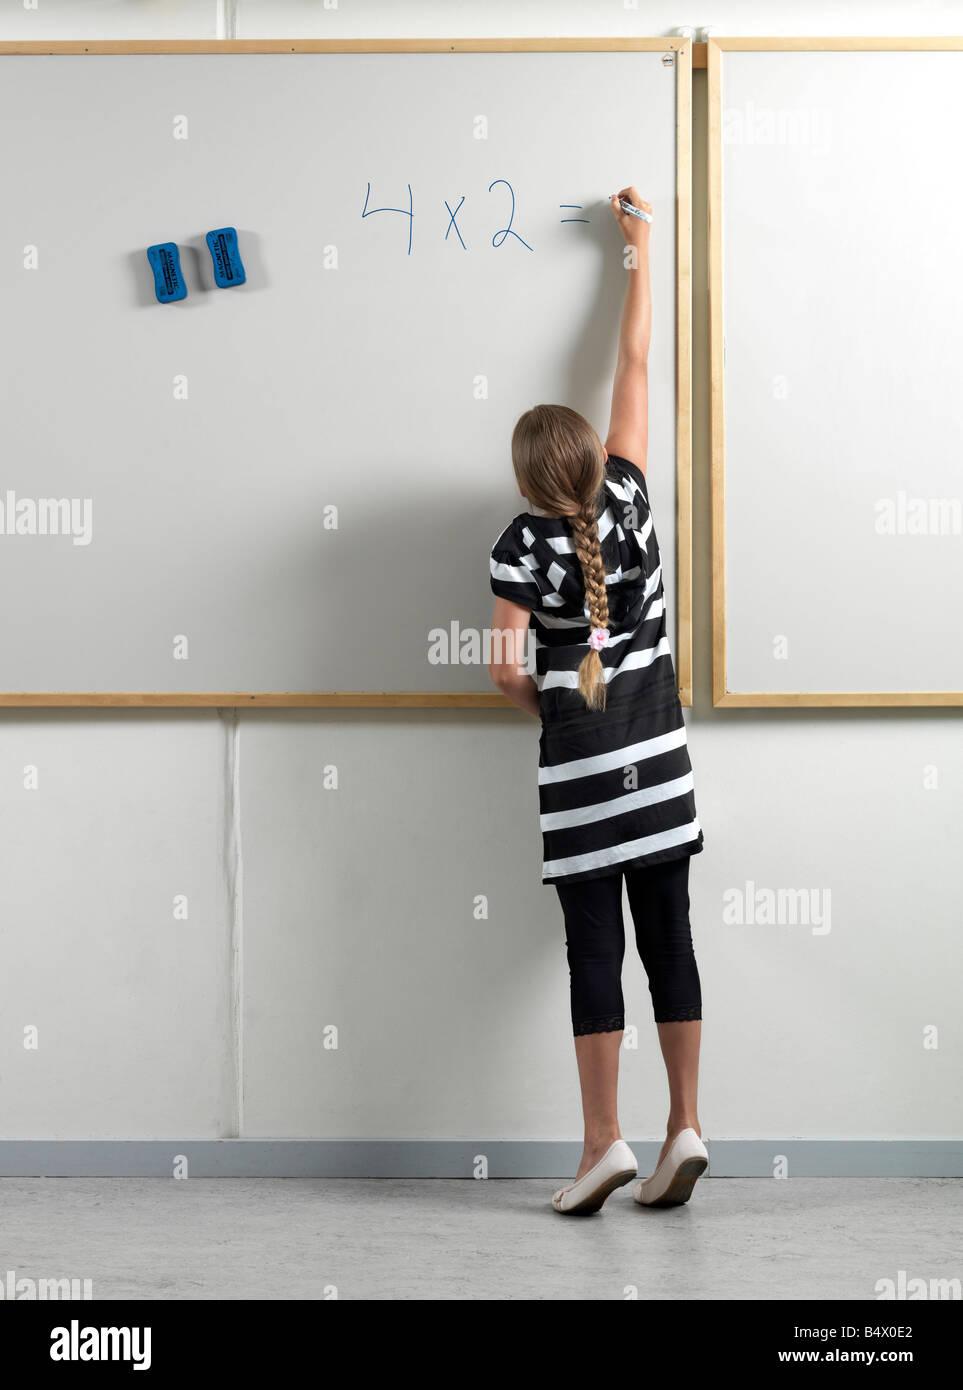 Girl writing on whiteboard - Stock Image